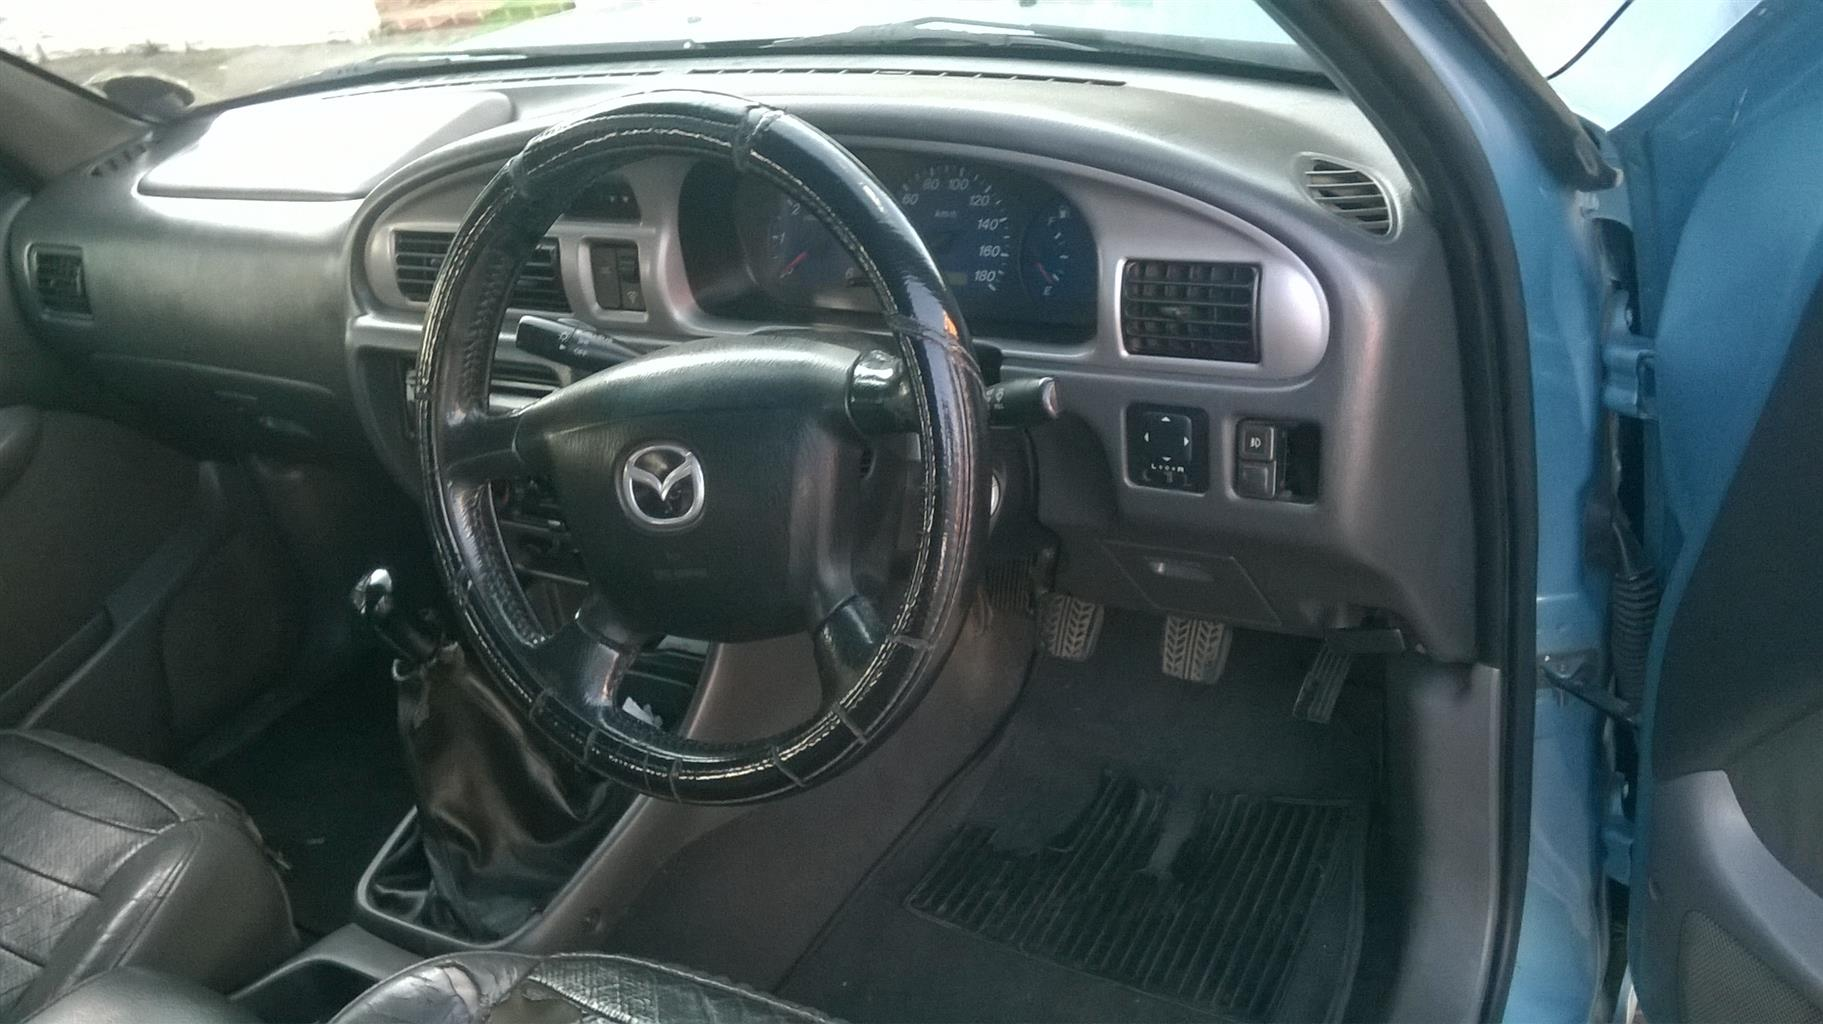 2004 Mazda Drifter B2500TD 4x4 double cab SLE